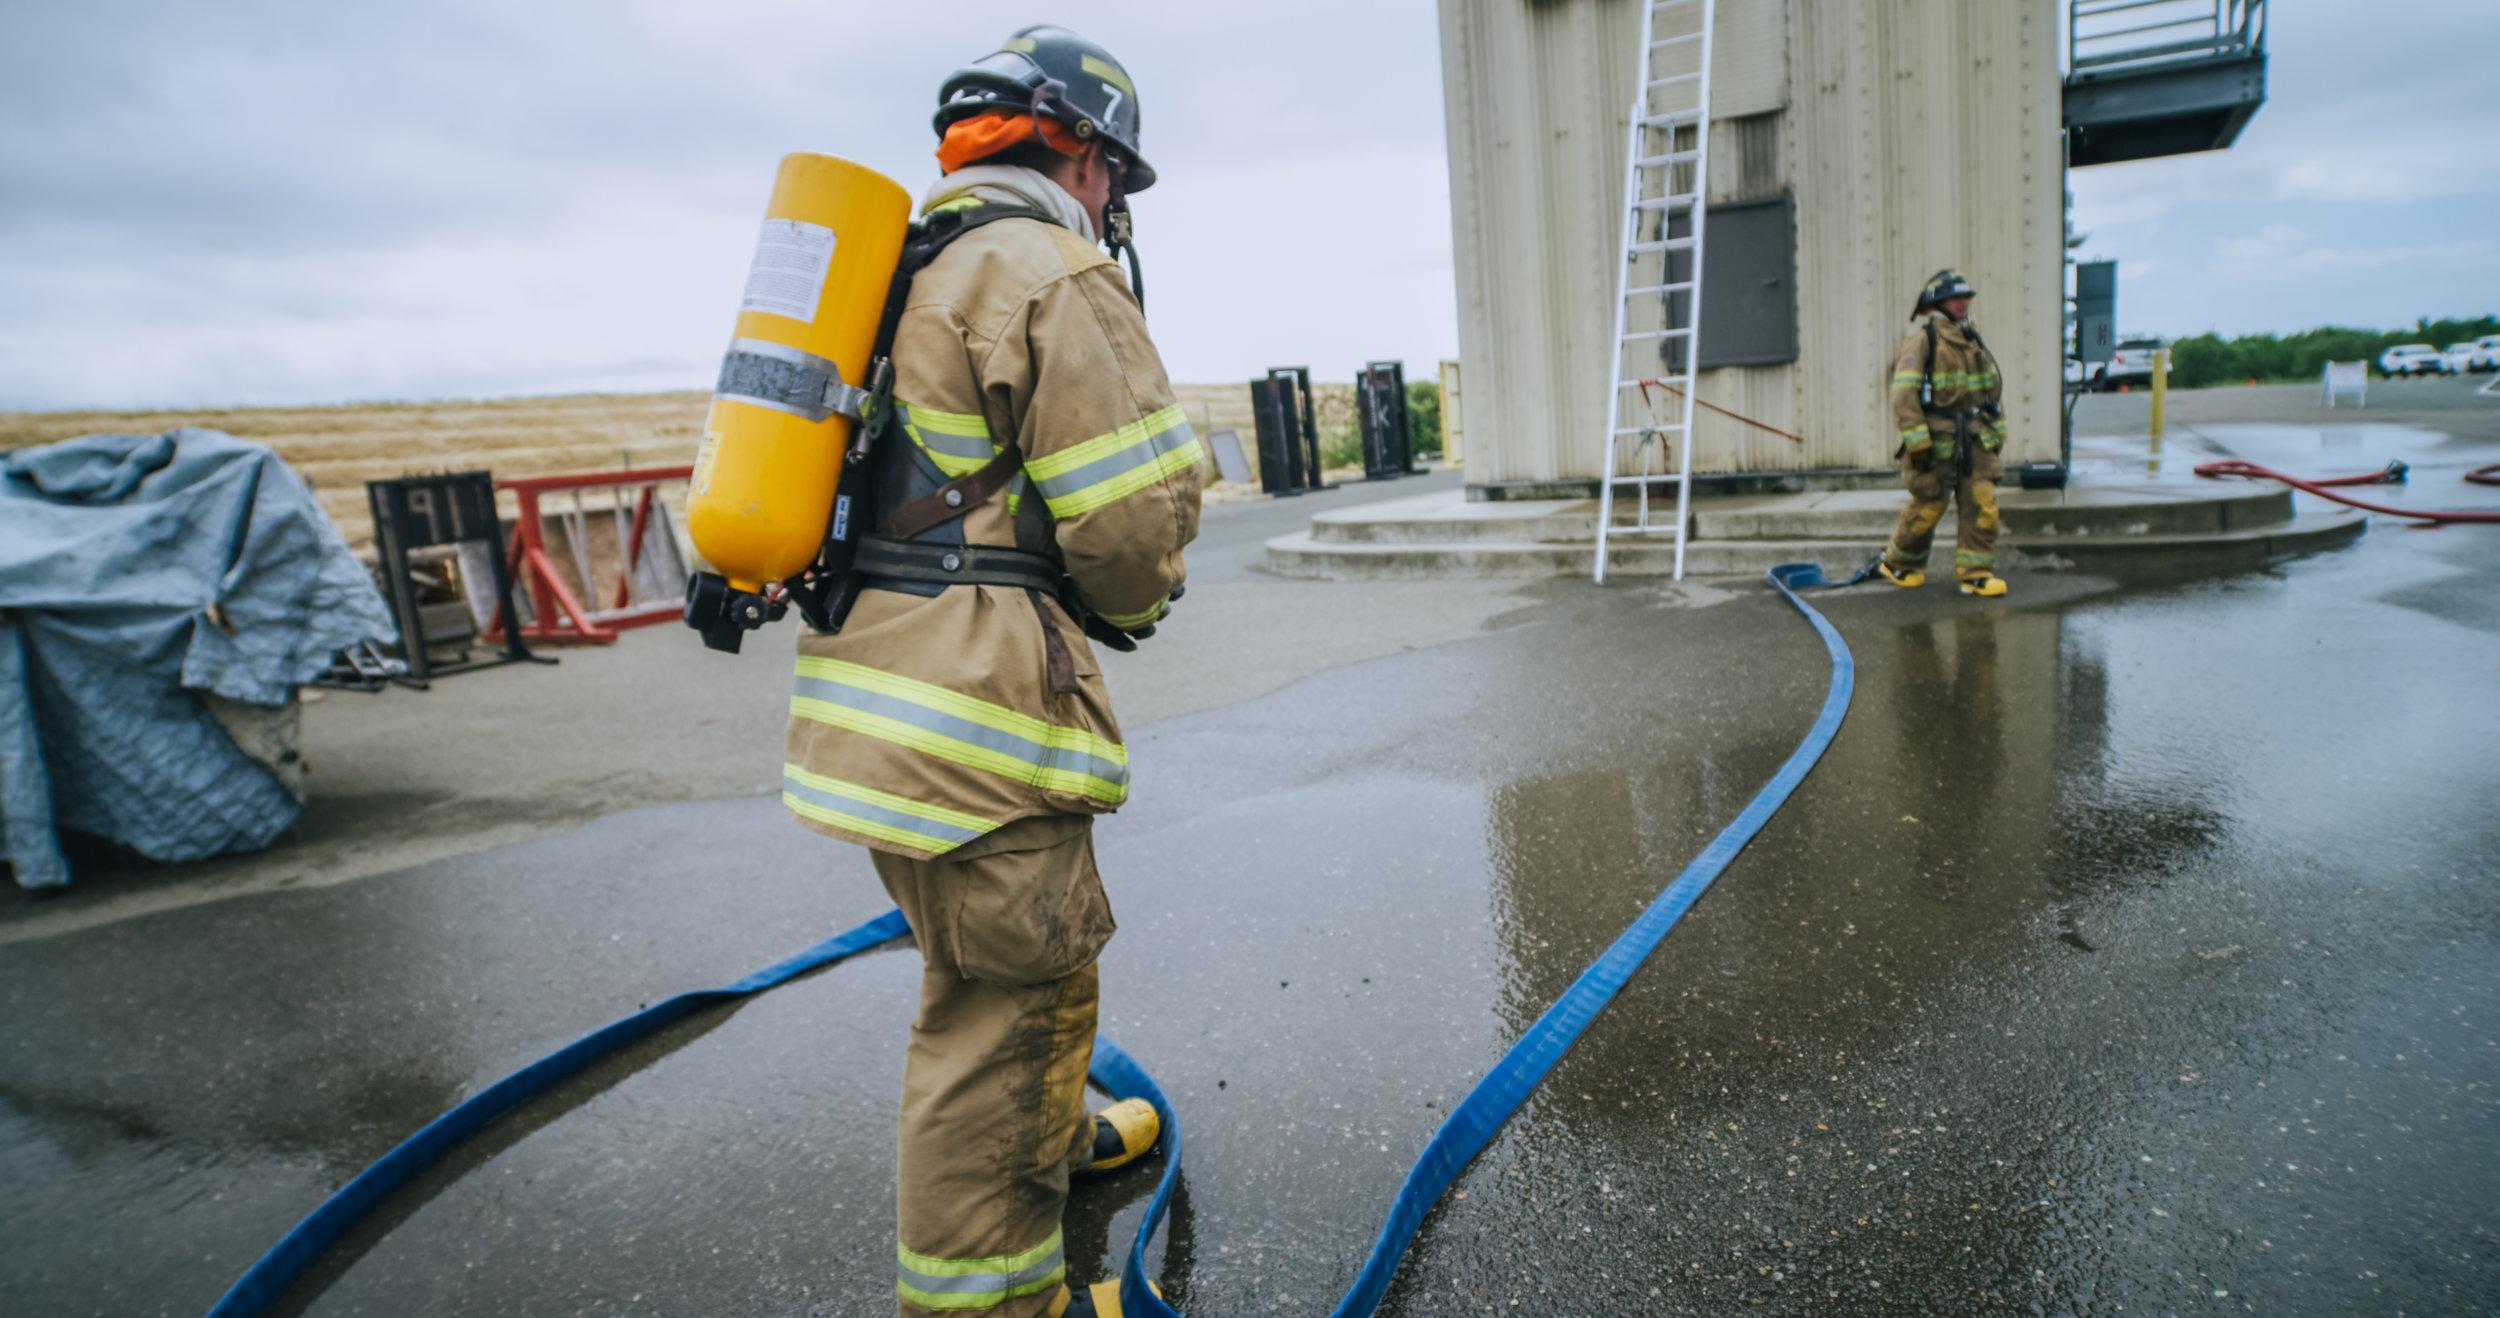 Firefighter student training